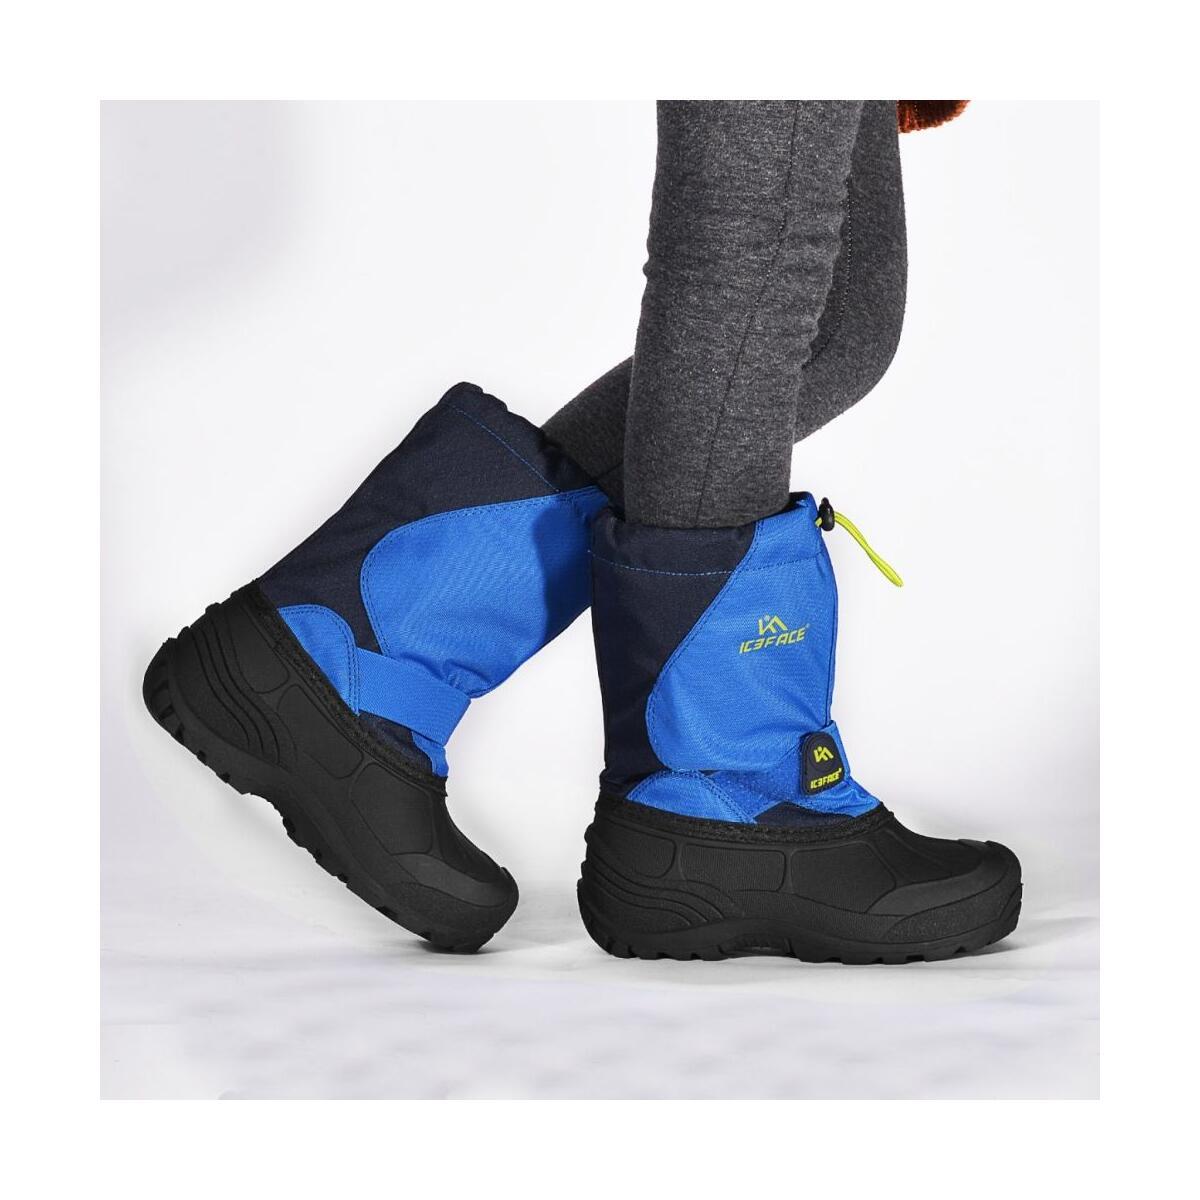 Mid Calf - Waterproof - Kids Snow Boots